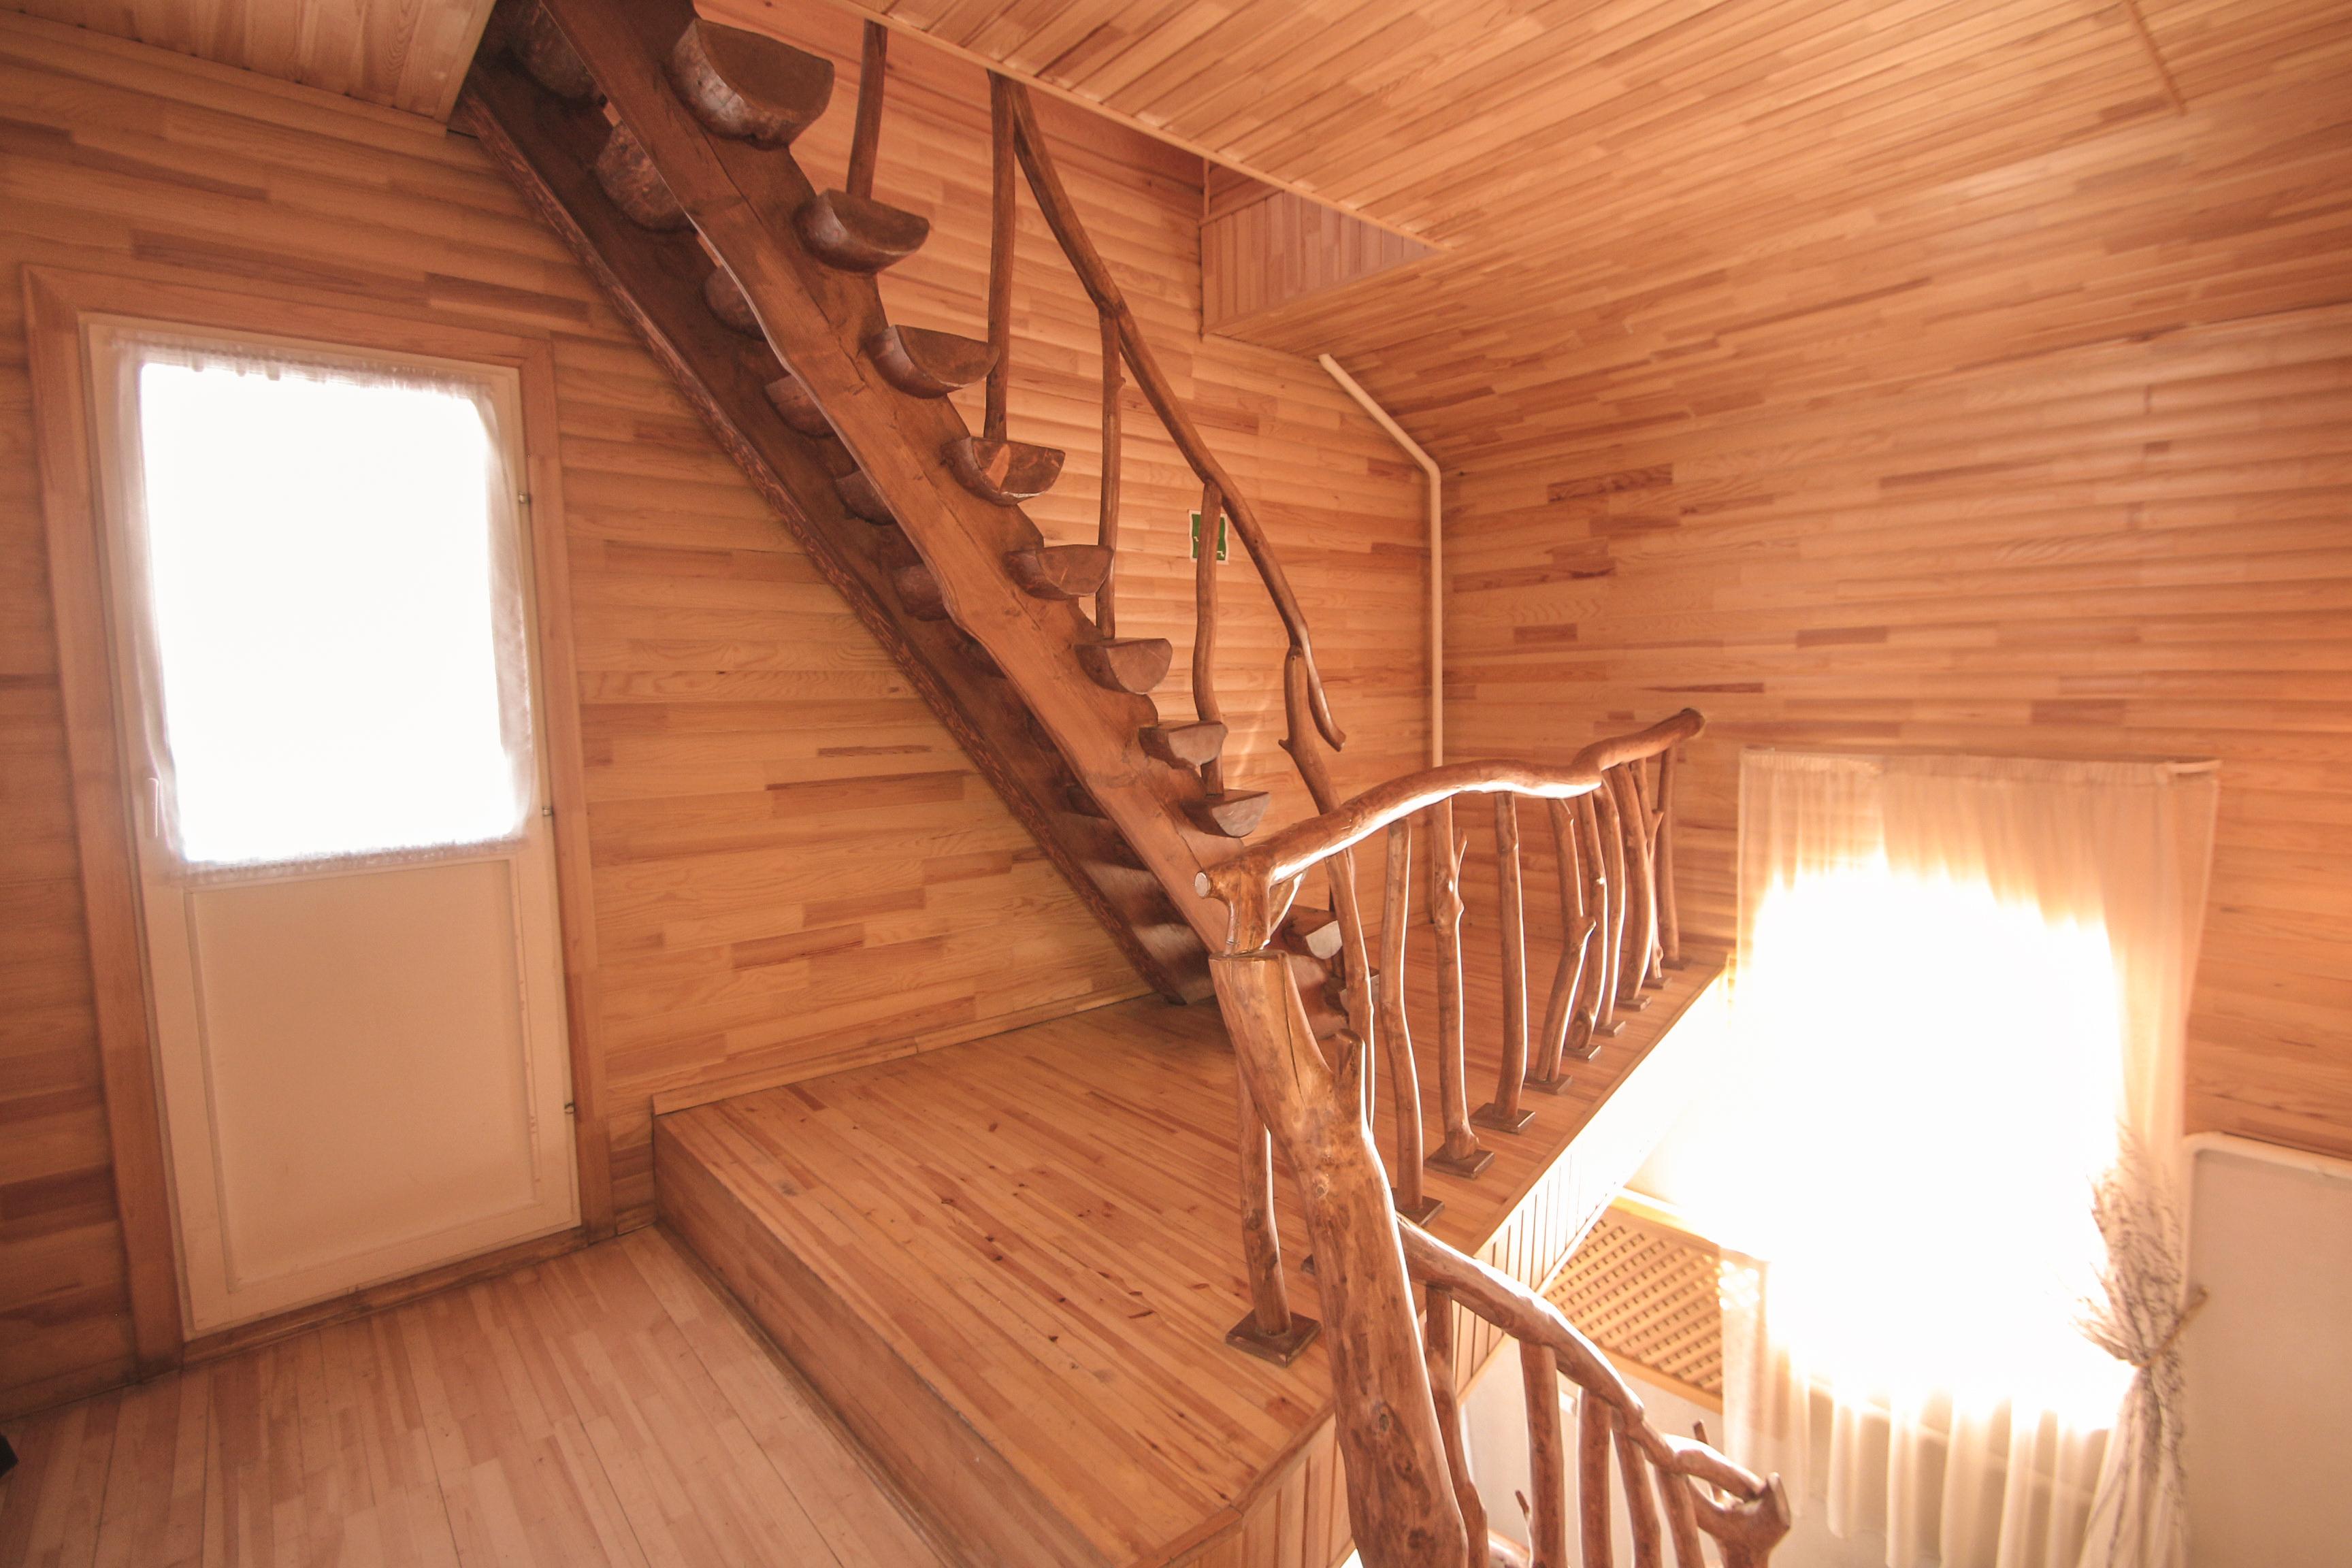 гостевой дом №1 лестница